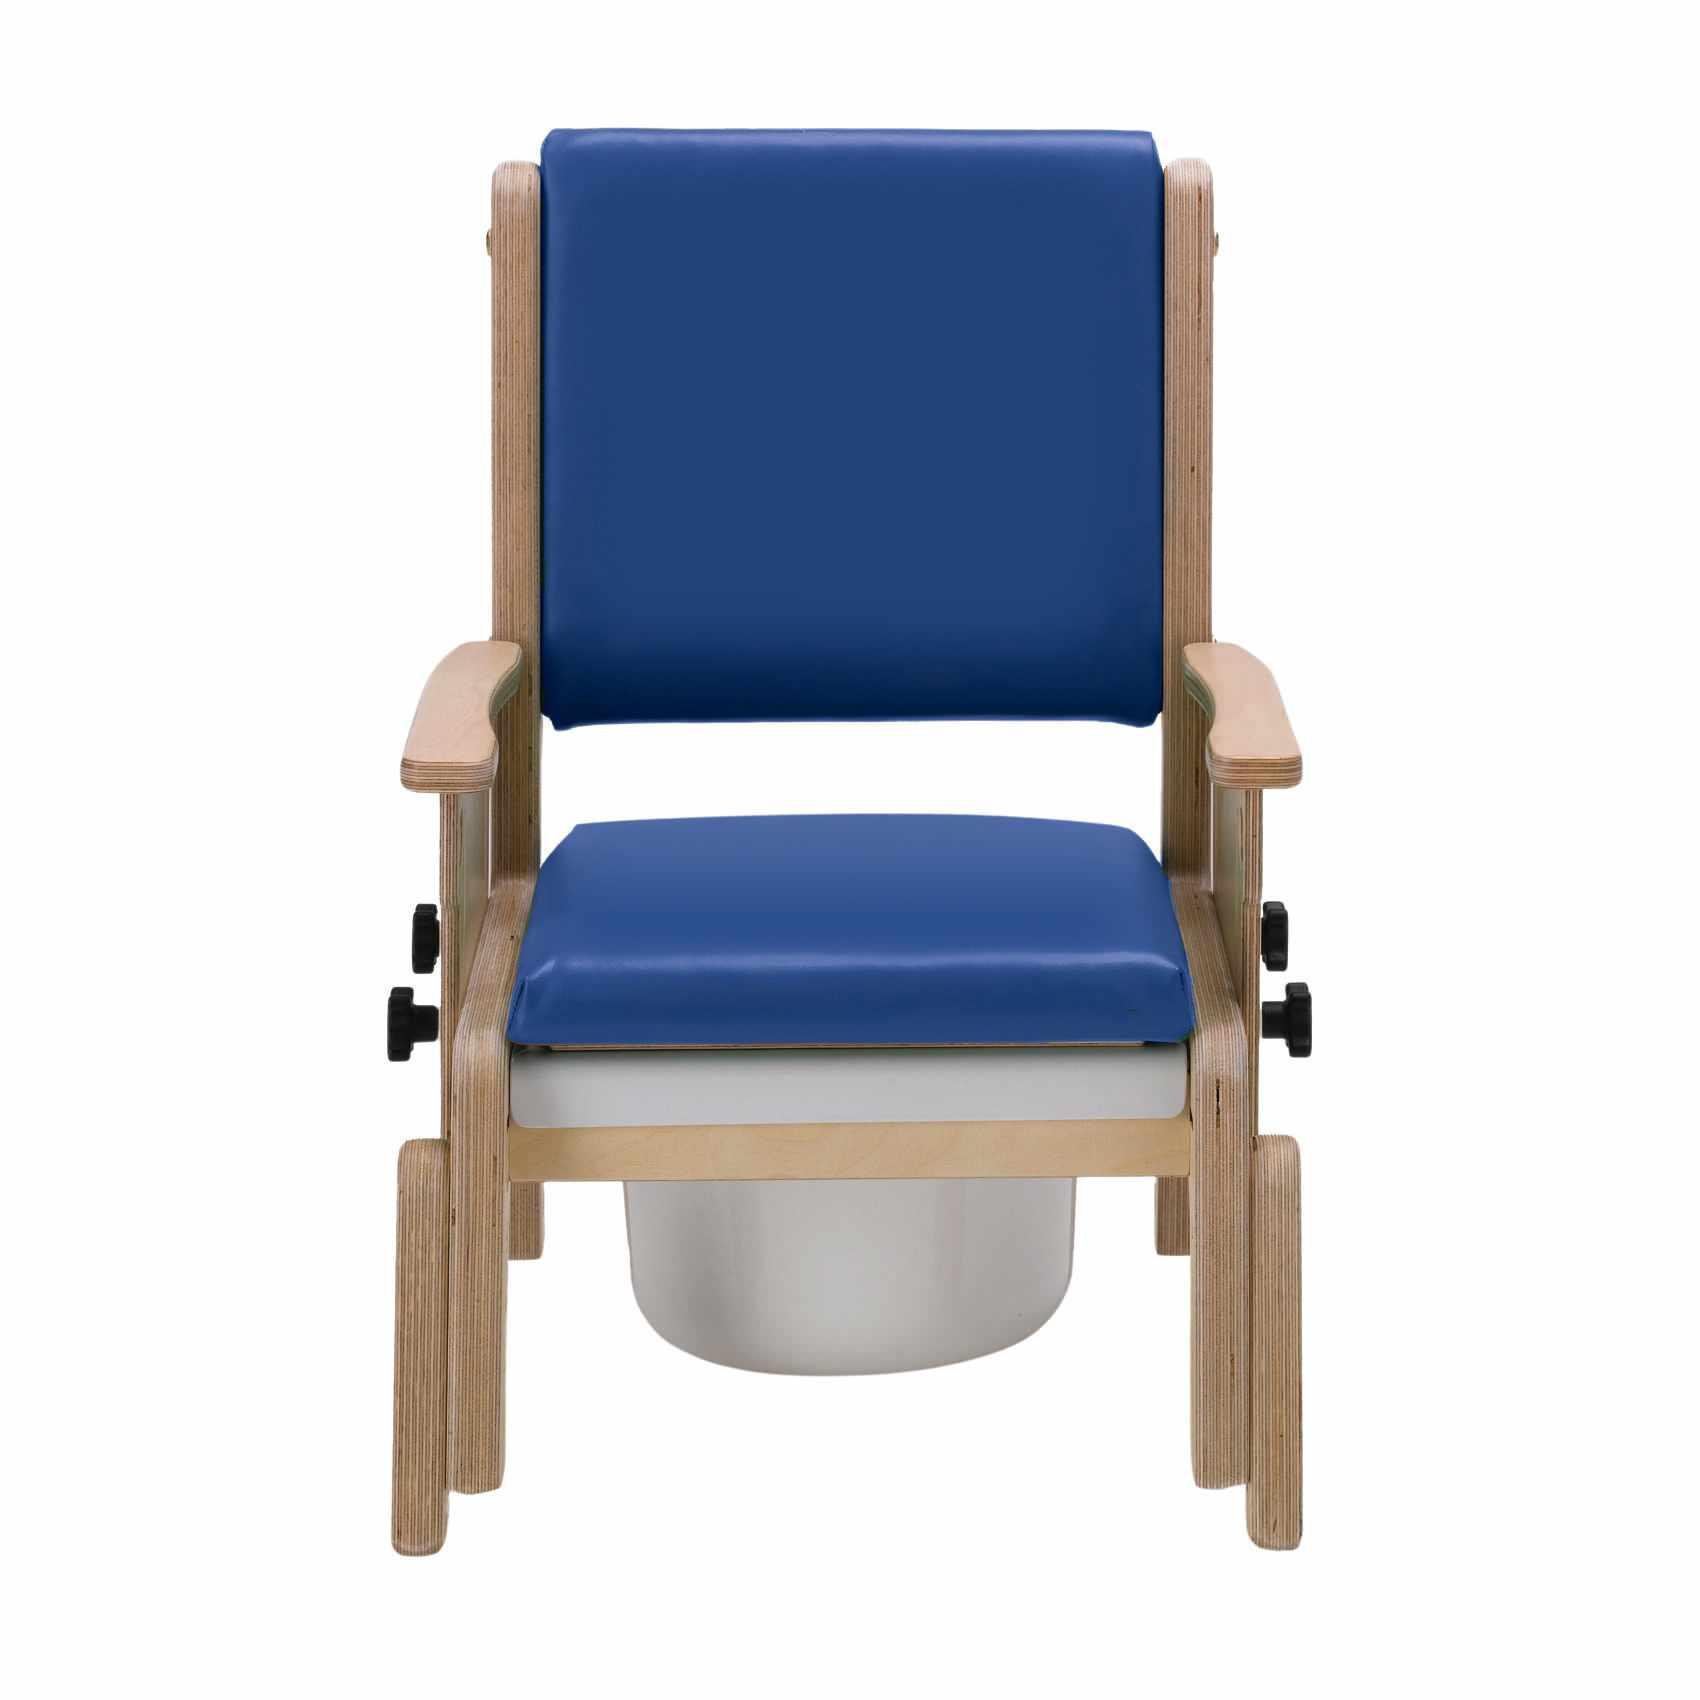 Smirthwaite Combi Toilet Chair